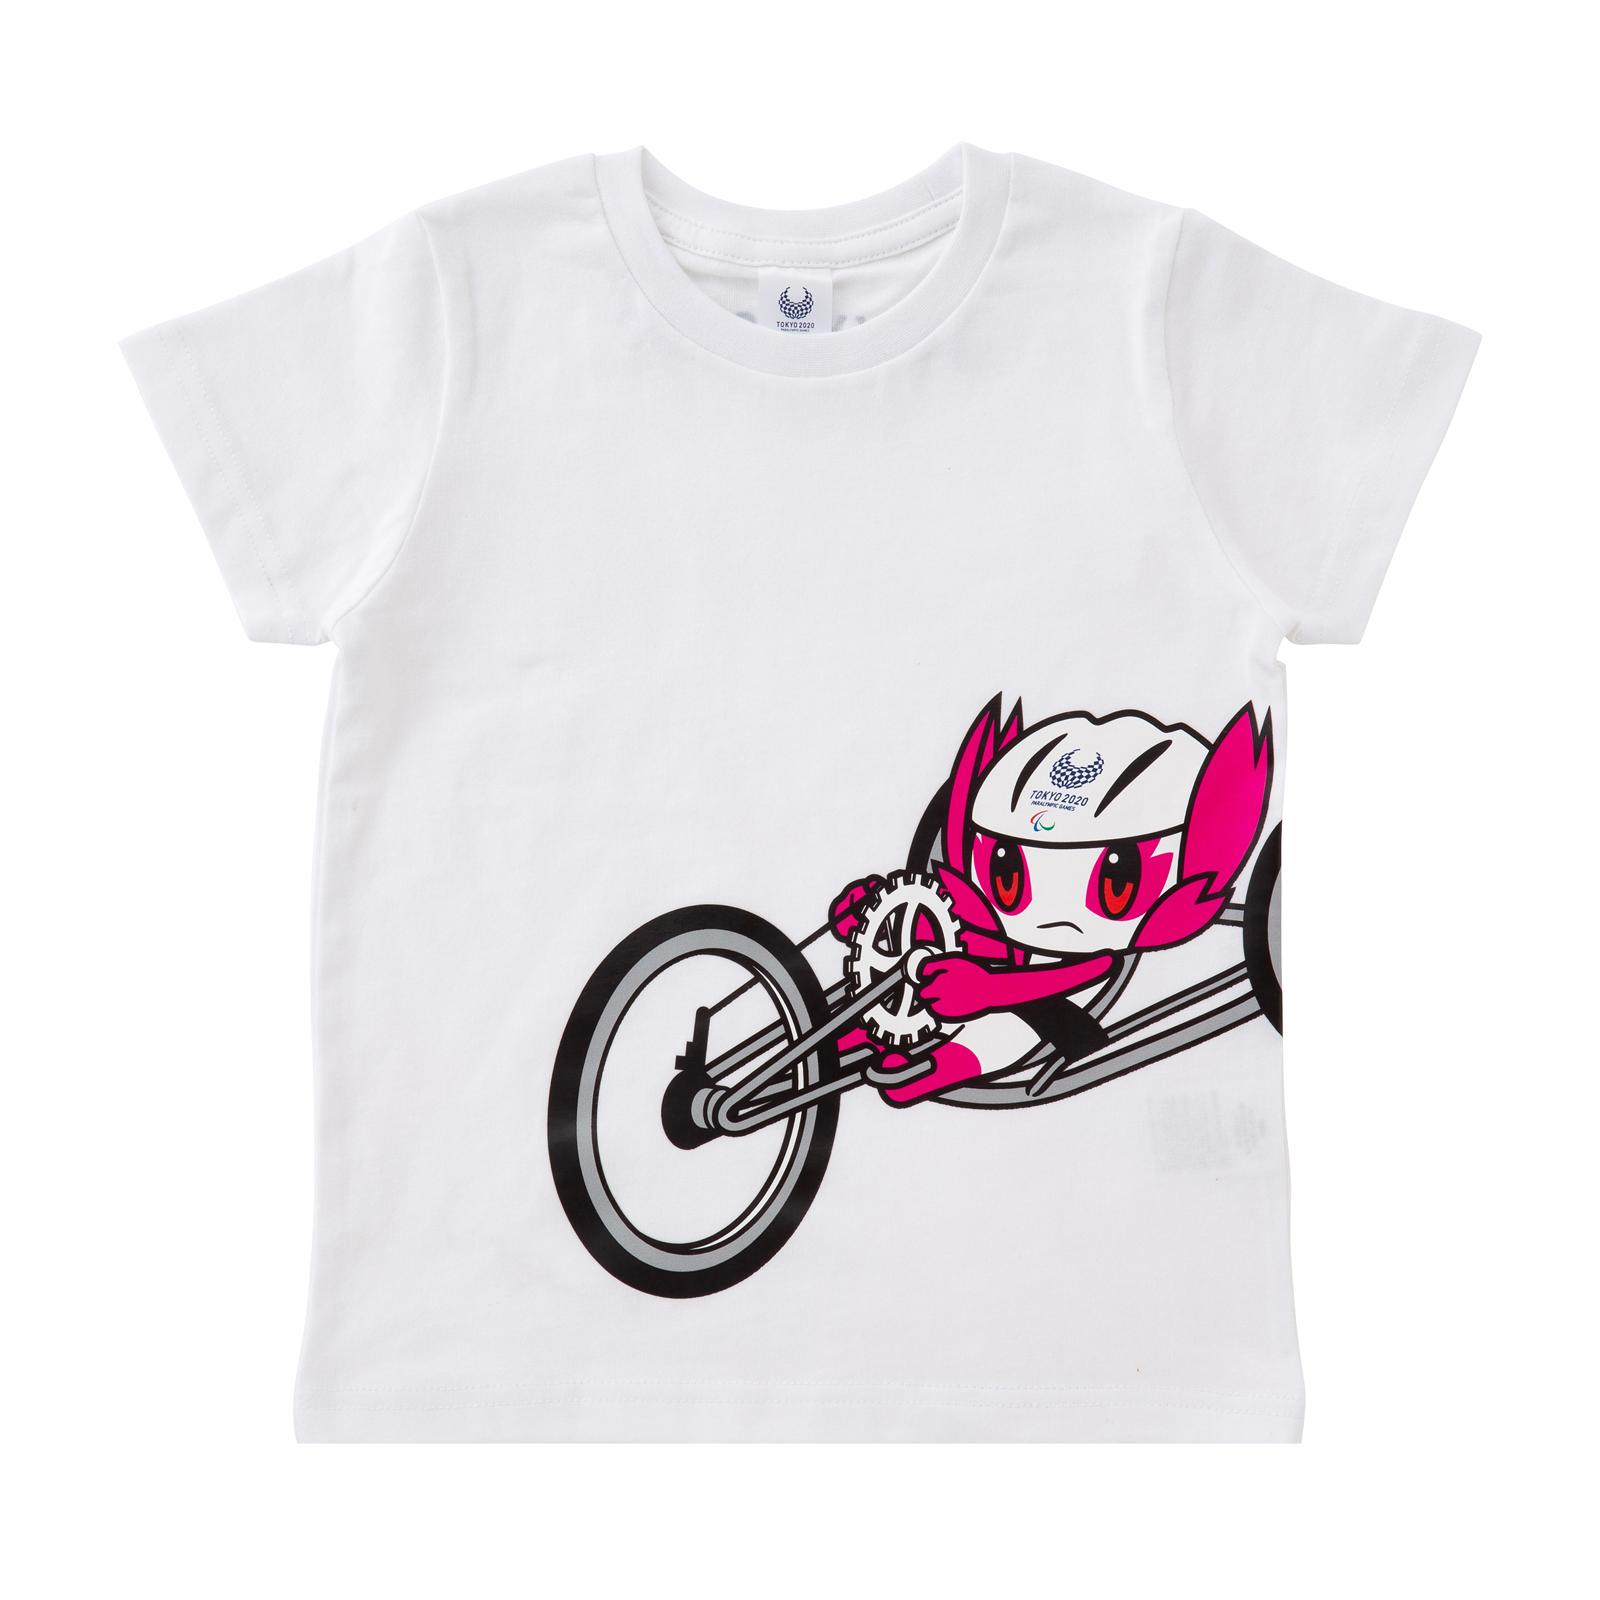 KIDSTシャツ 自転車競技 ロード(東京2020パラリンピックマスコット)